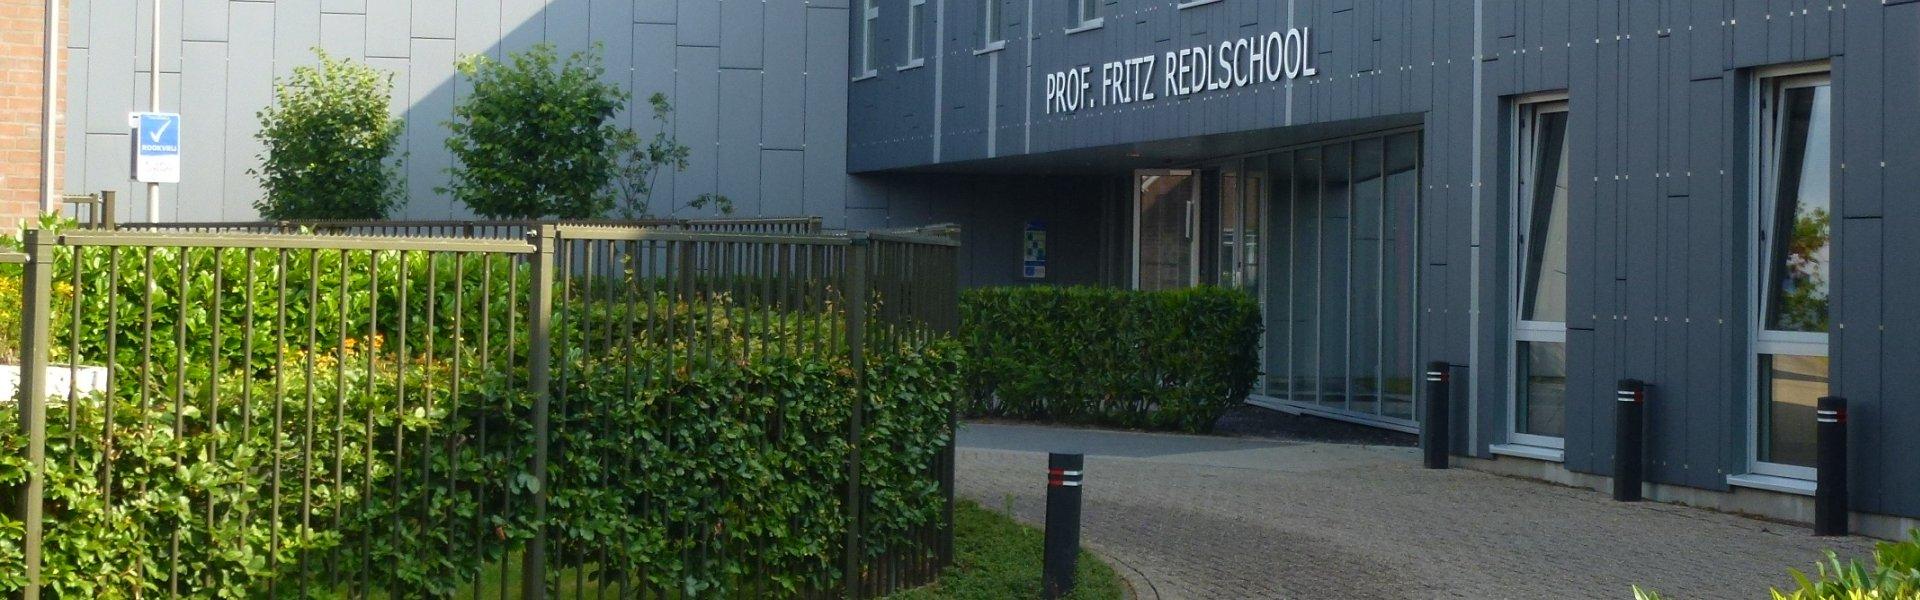 Professor Frits Redlschool Utrecht